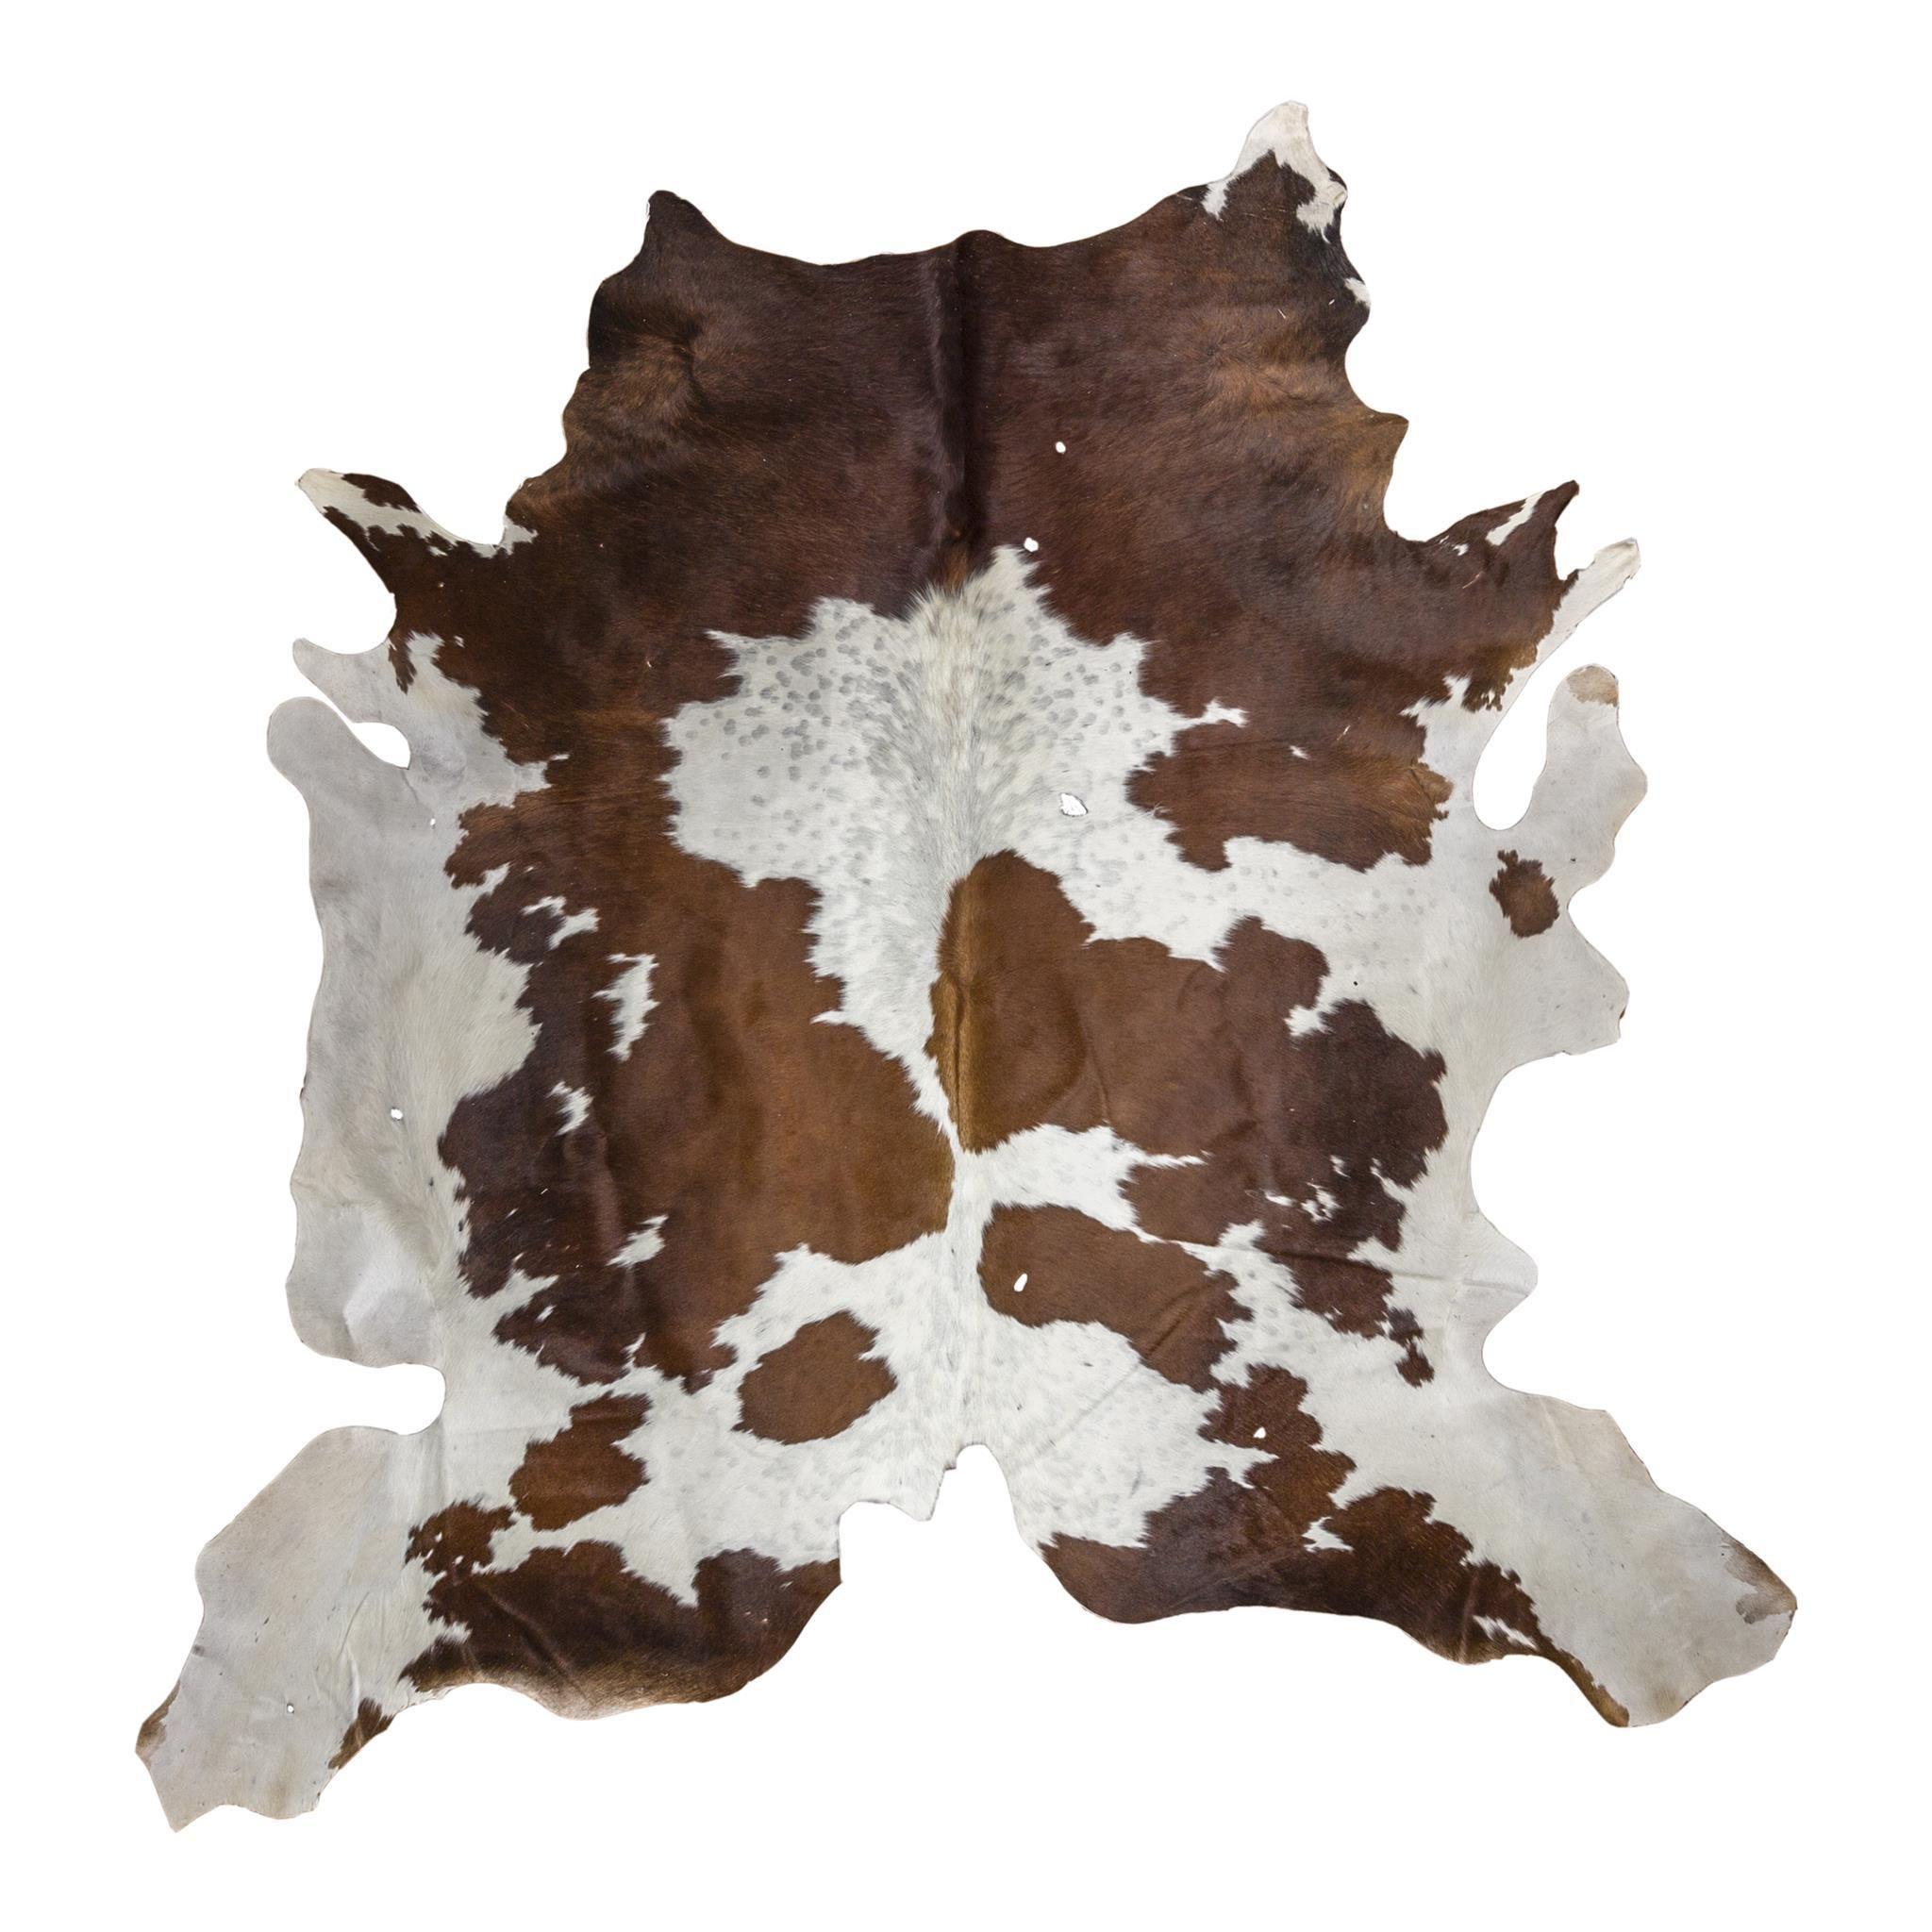 Brown White Natural Cowhide Rug In 2020 Cow Hide Rug Natural Cowhide Natural Rug